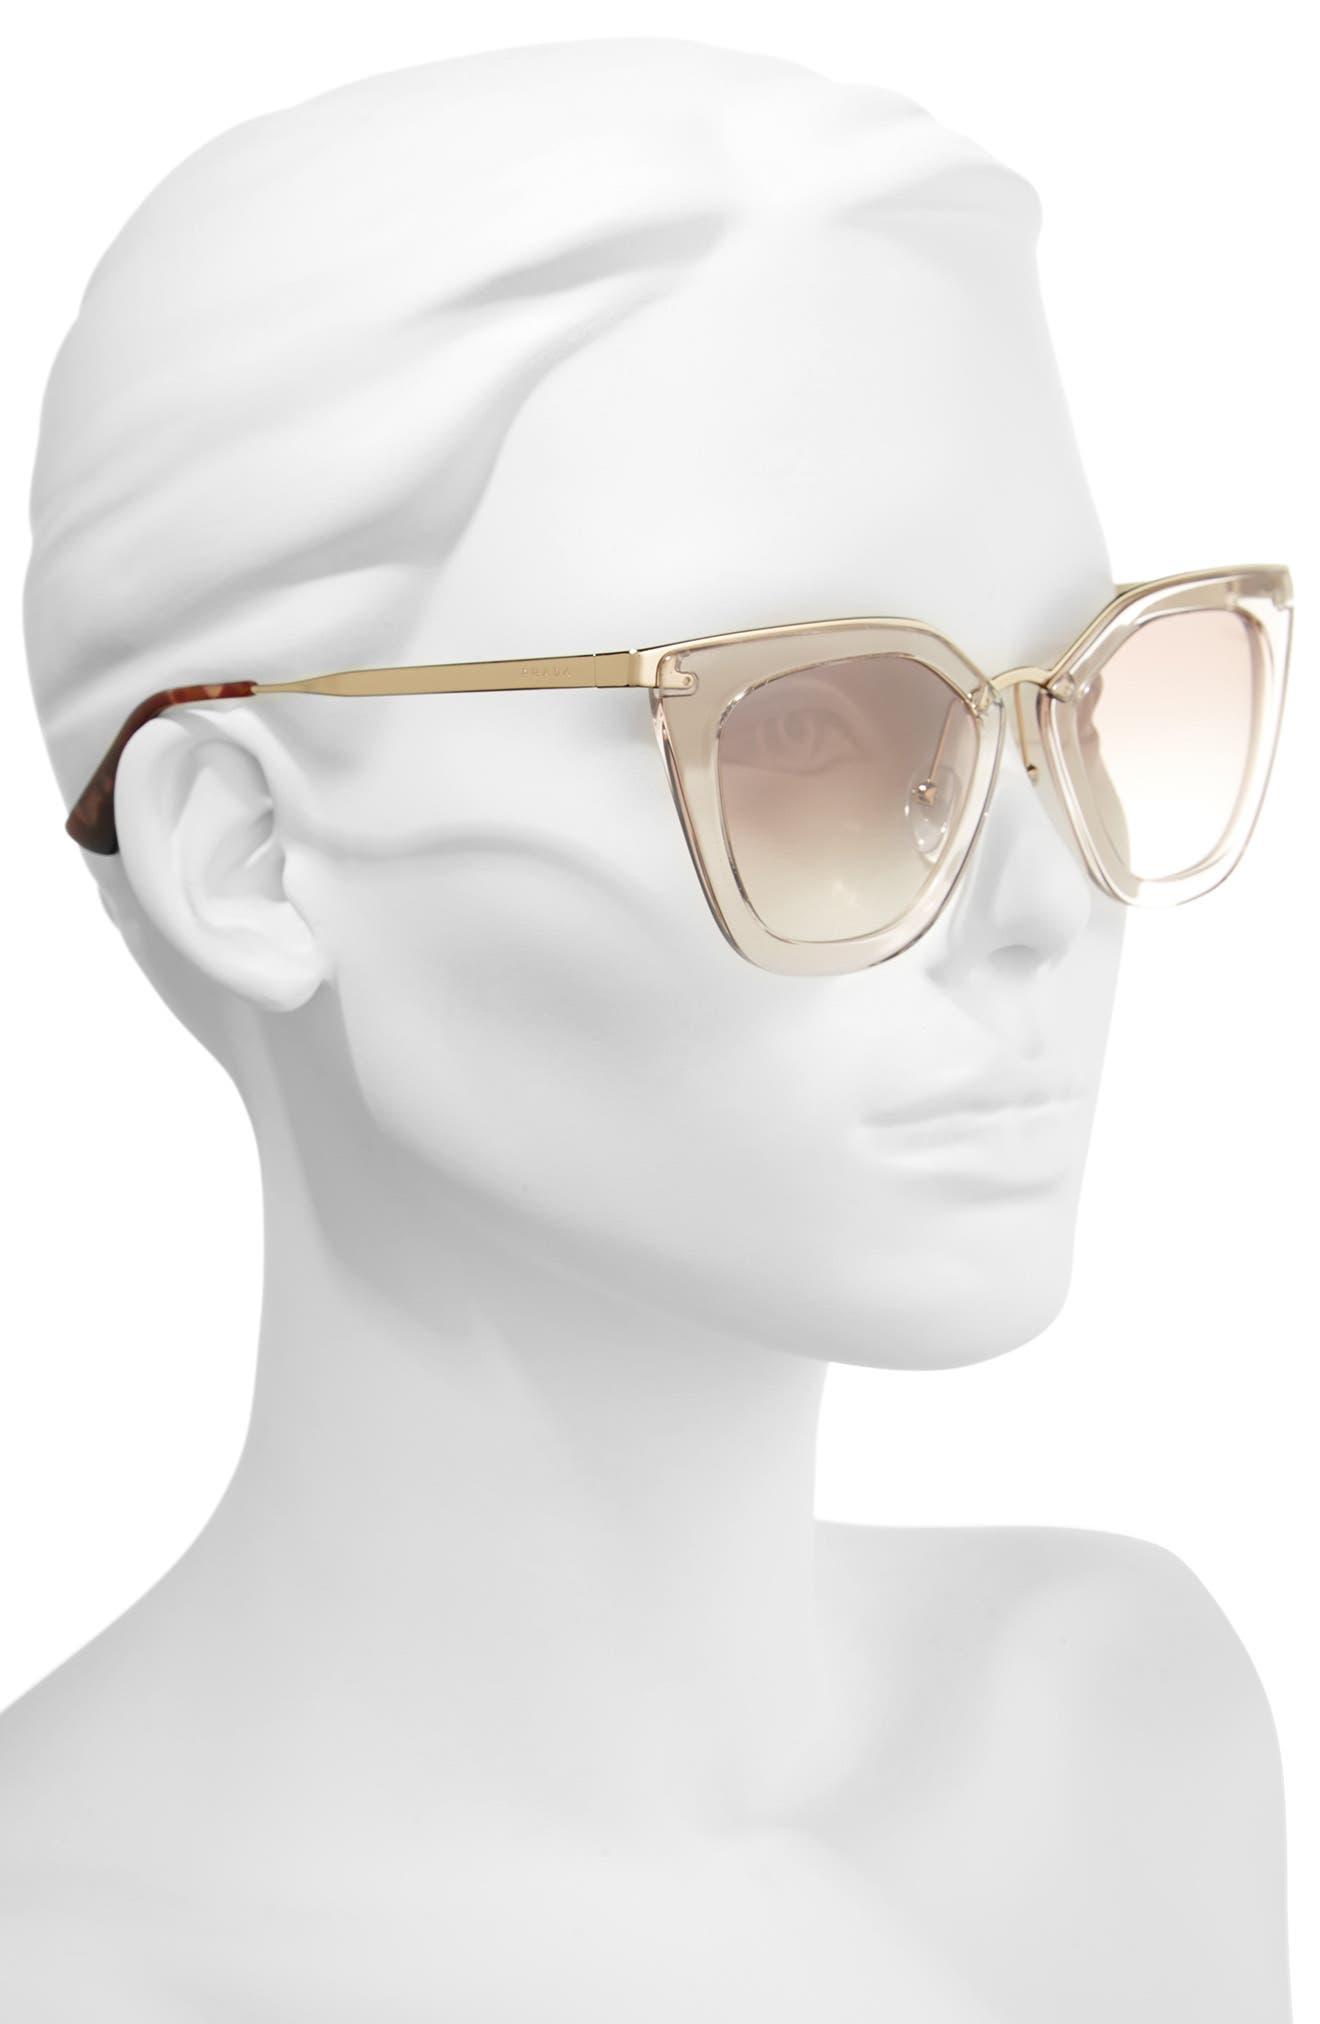 52mm Retro Sunglasses,                             Alternate thumbnail 3, color,                             200